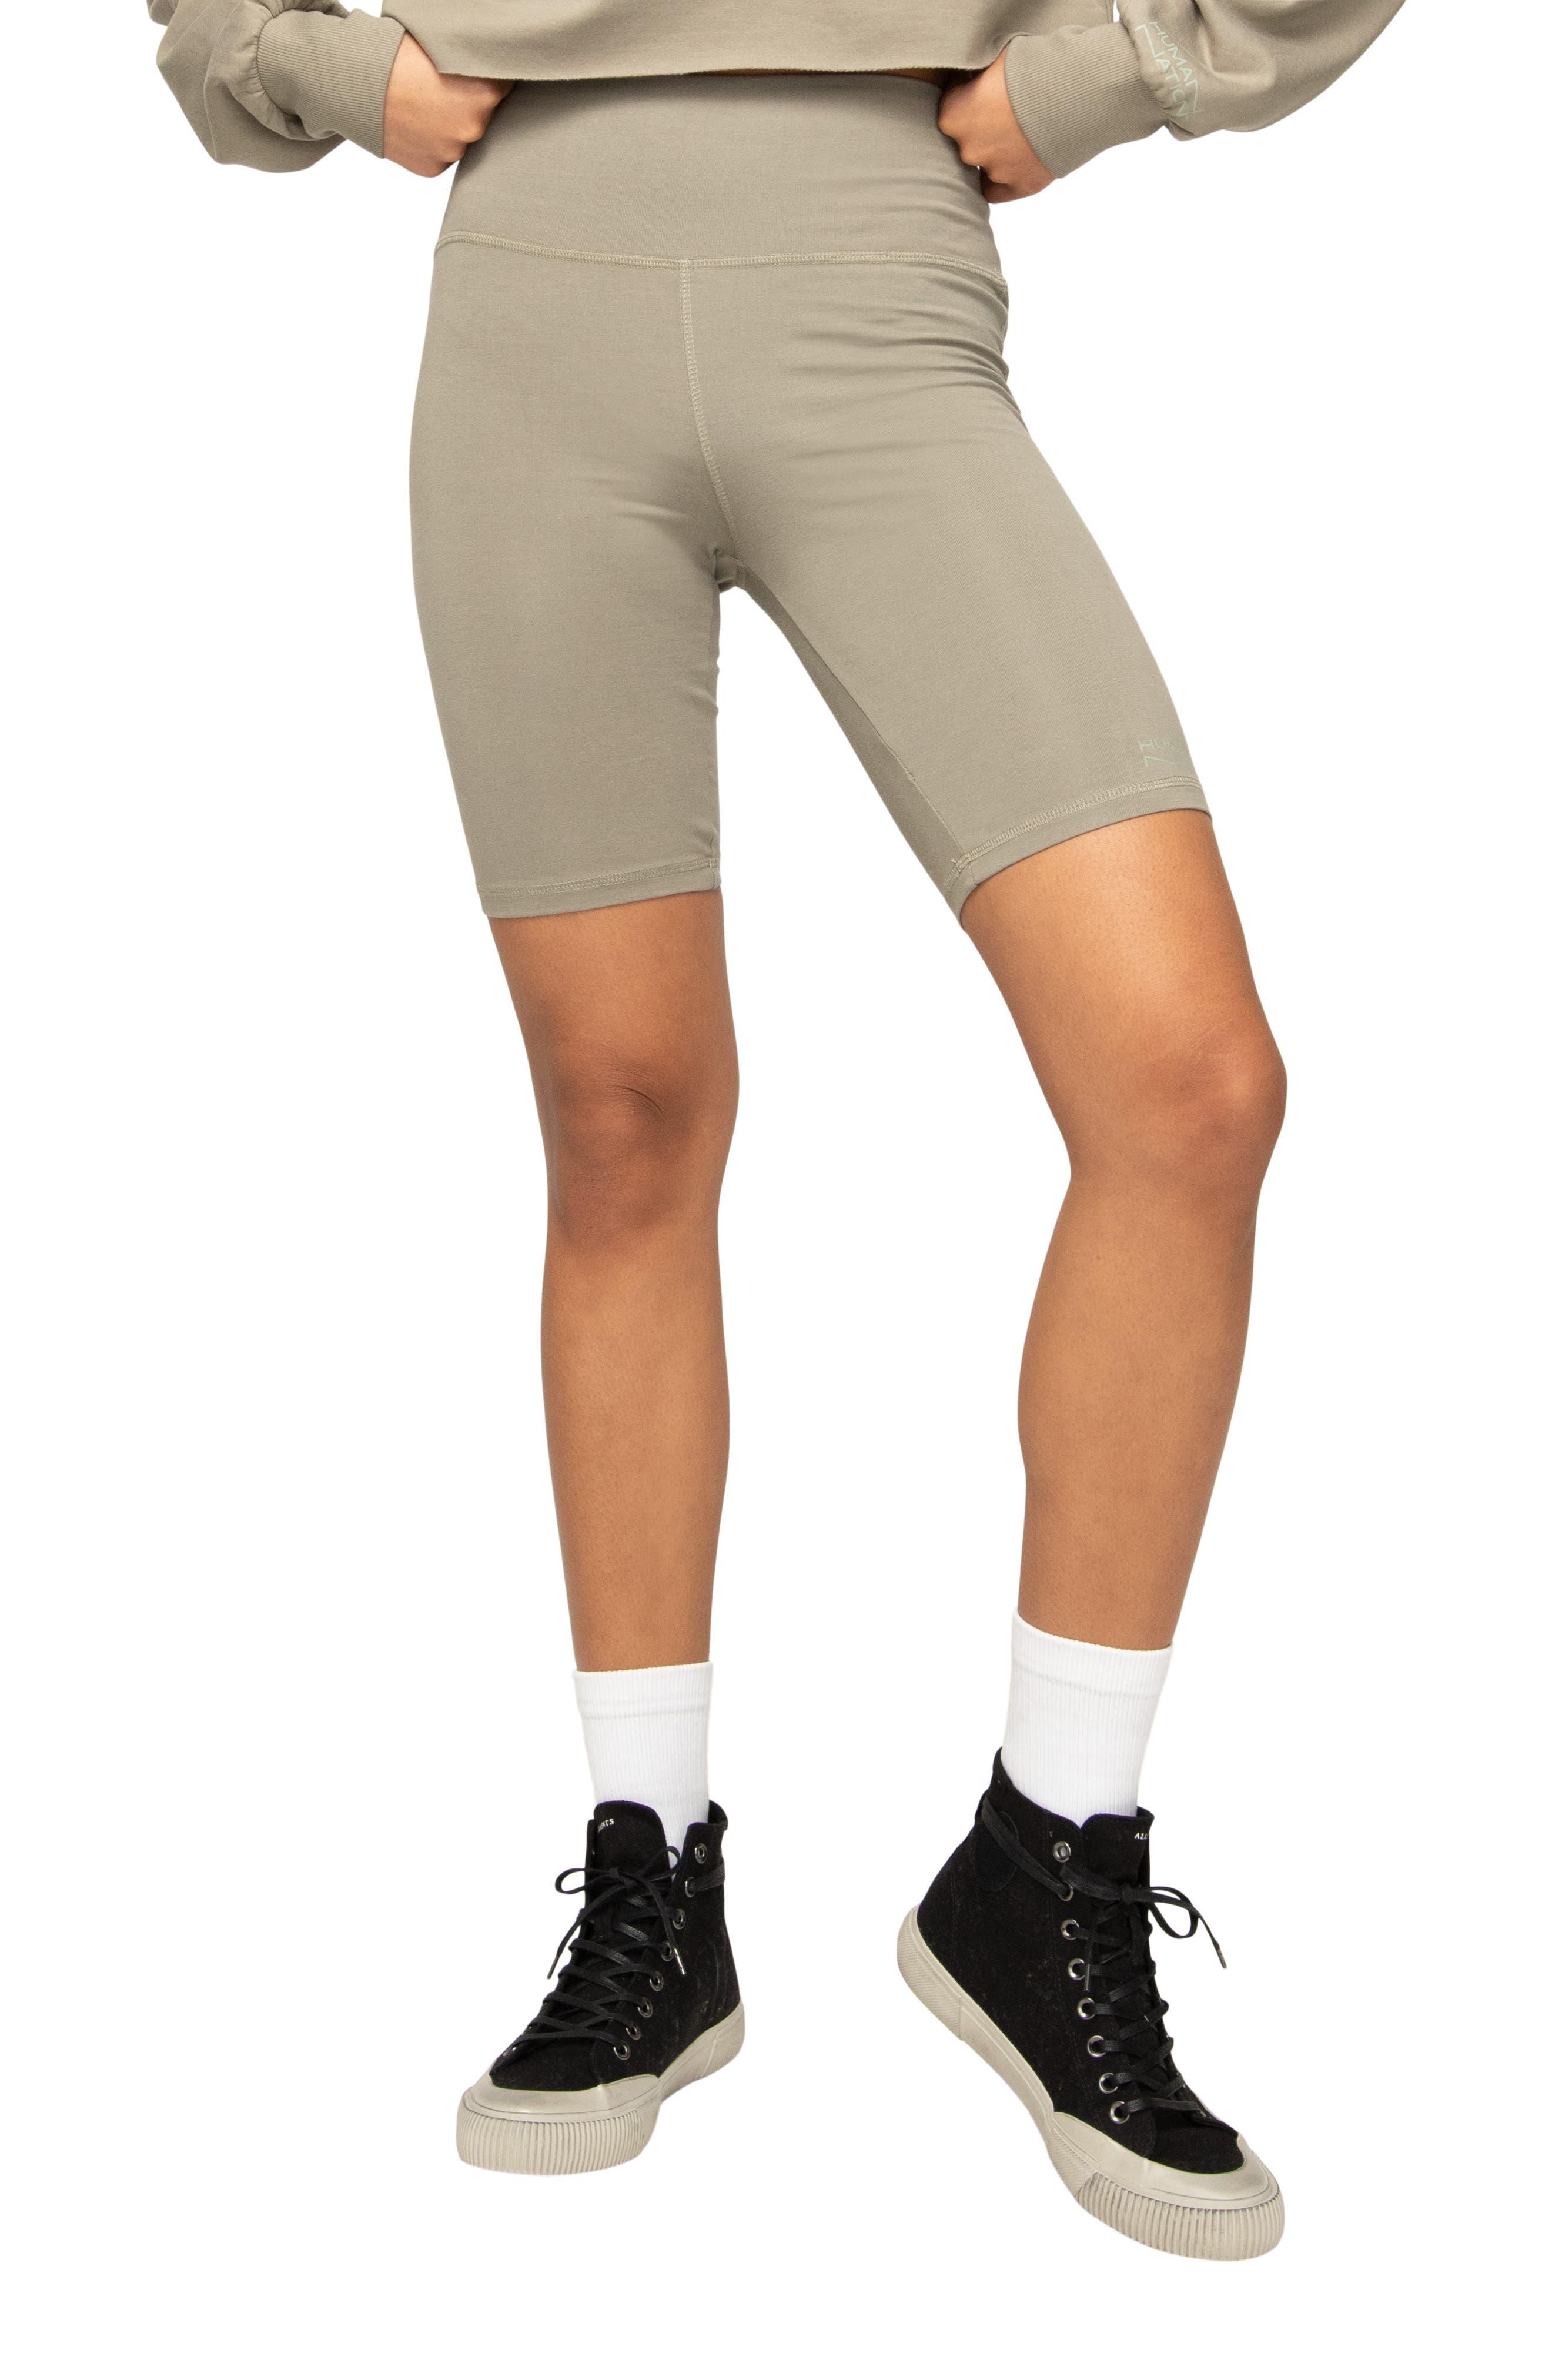 Gender Inclusive Momentum Biker Shorts